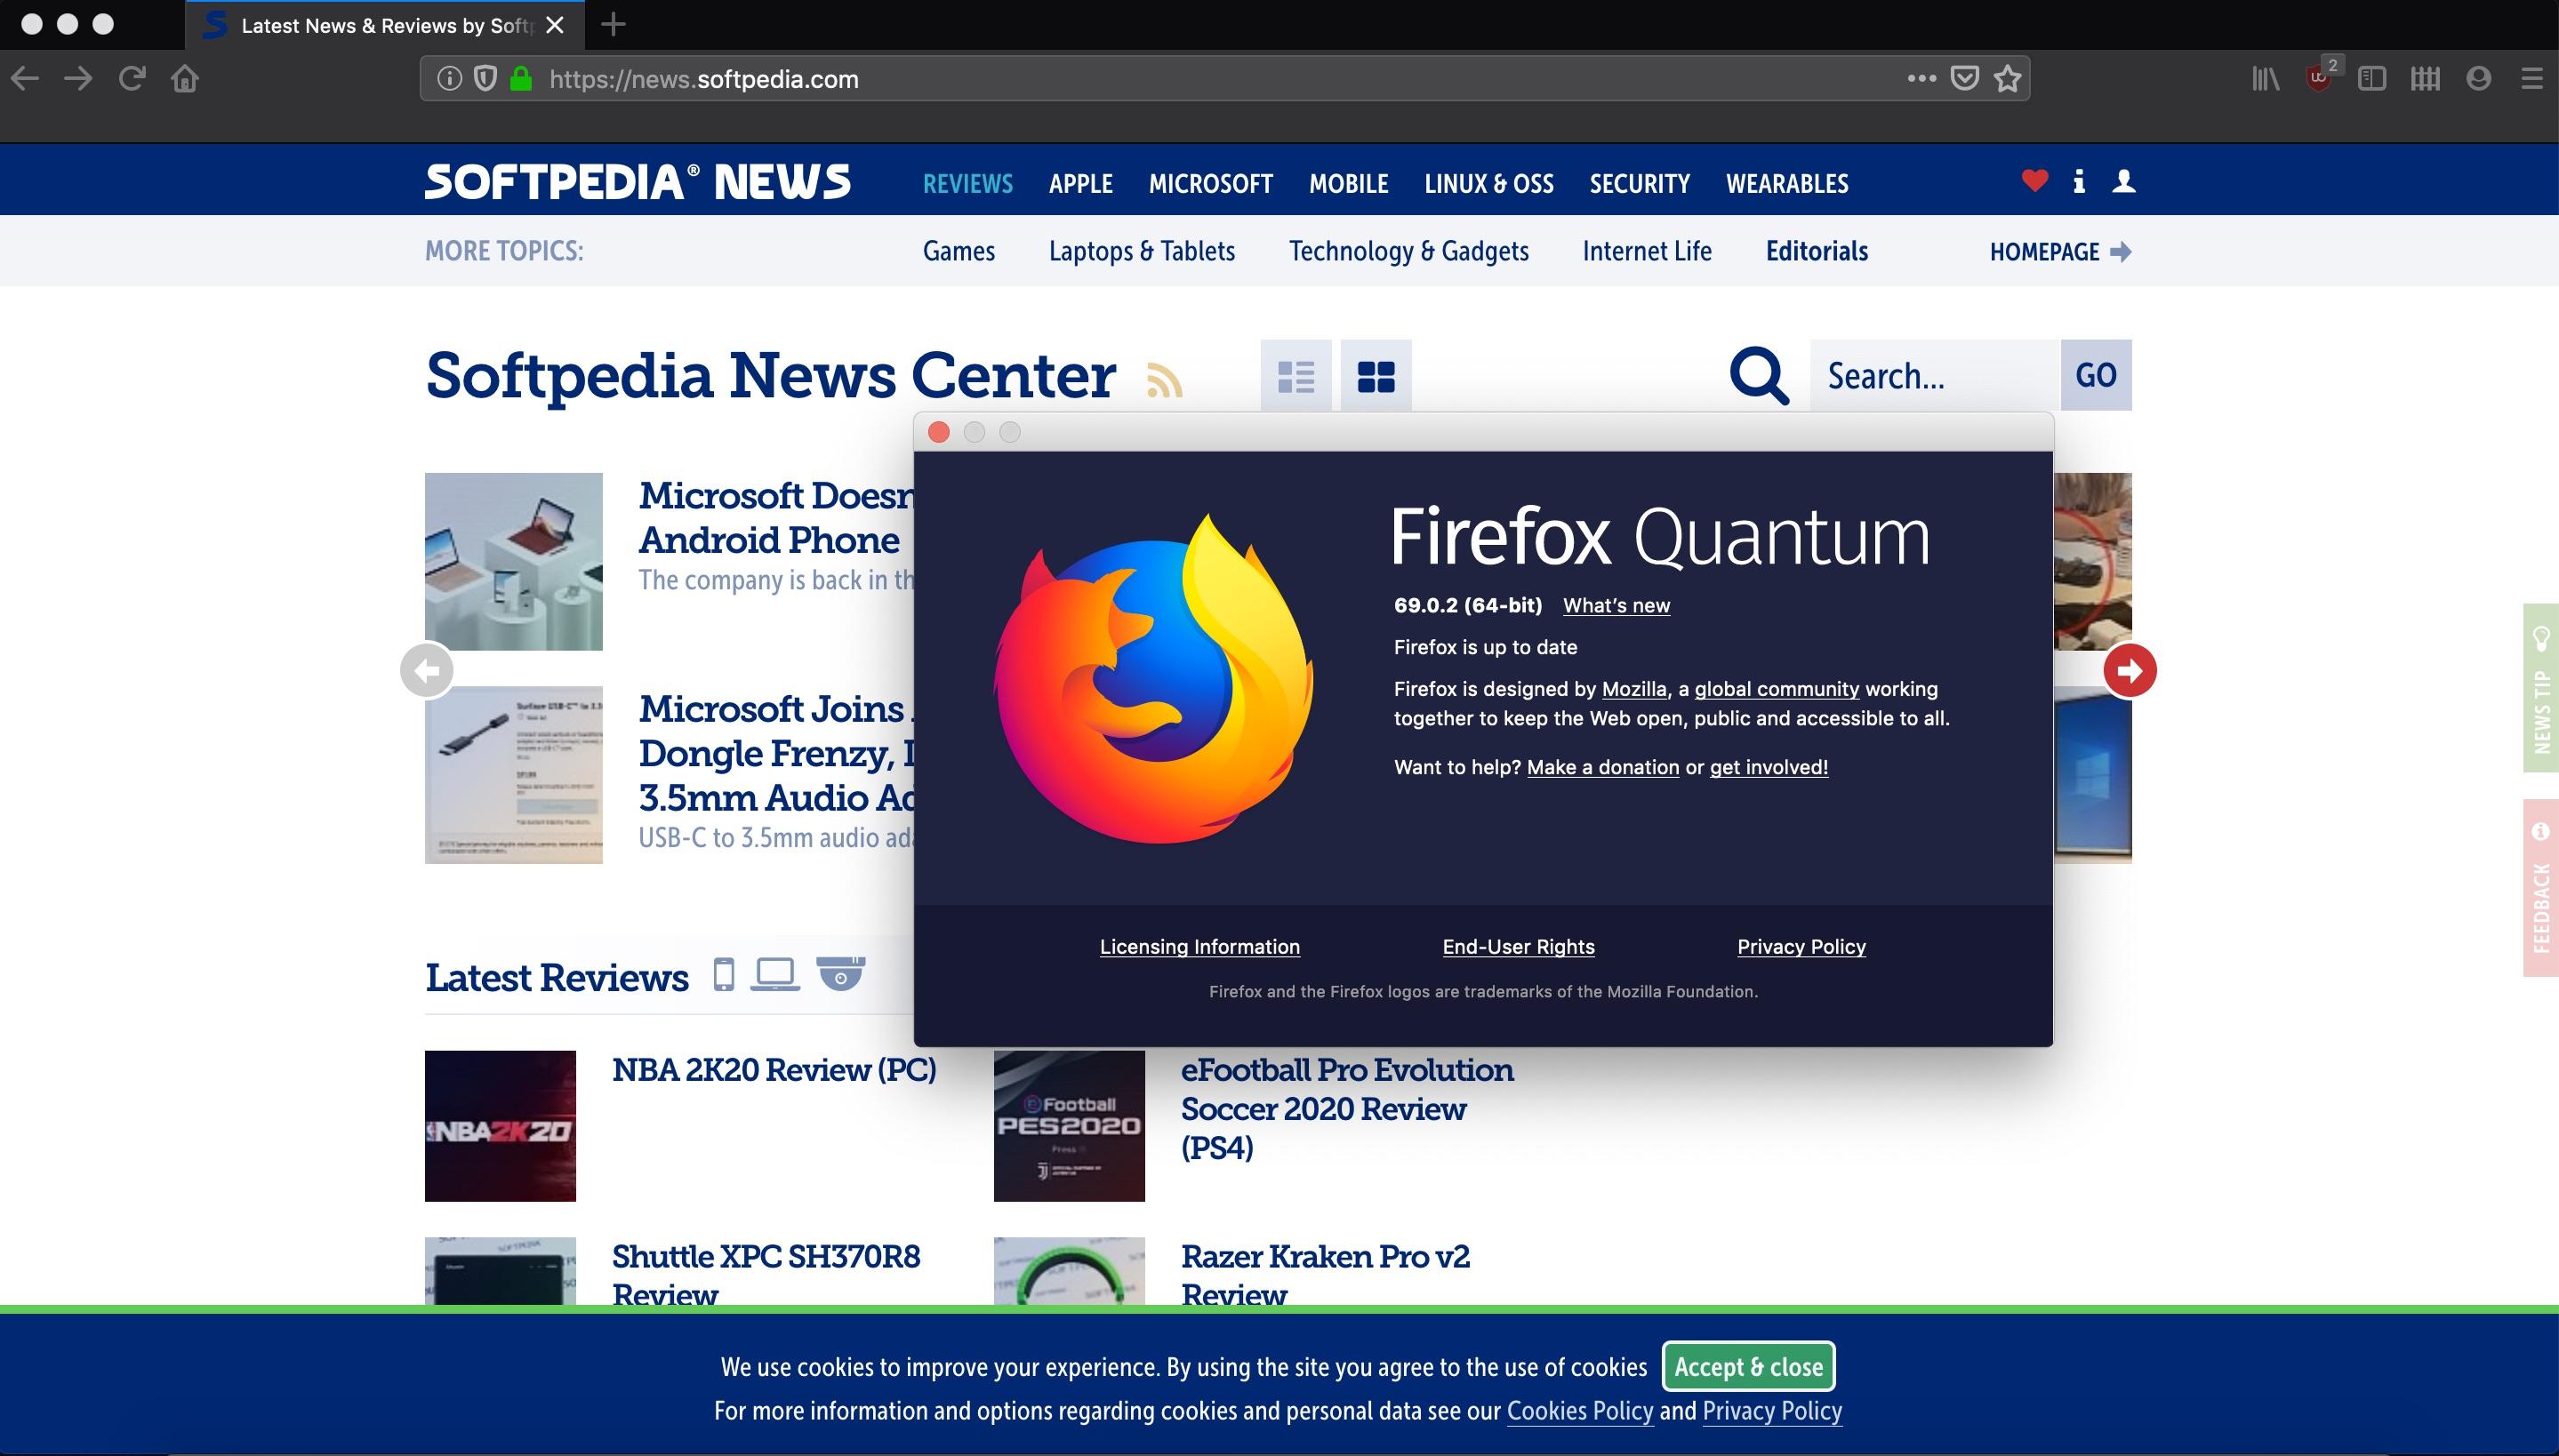 Softpedia News